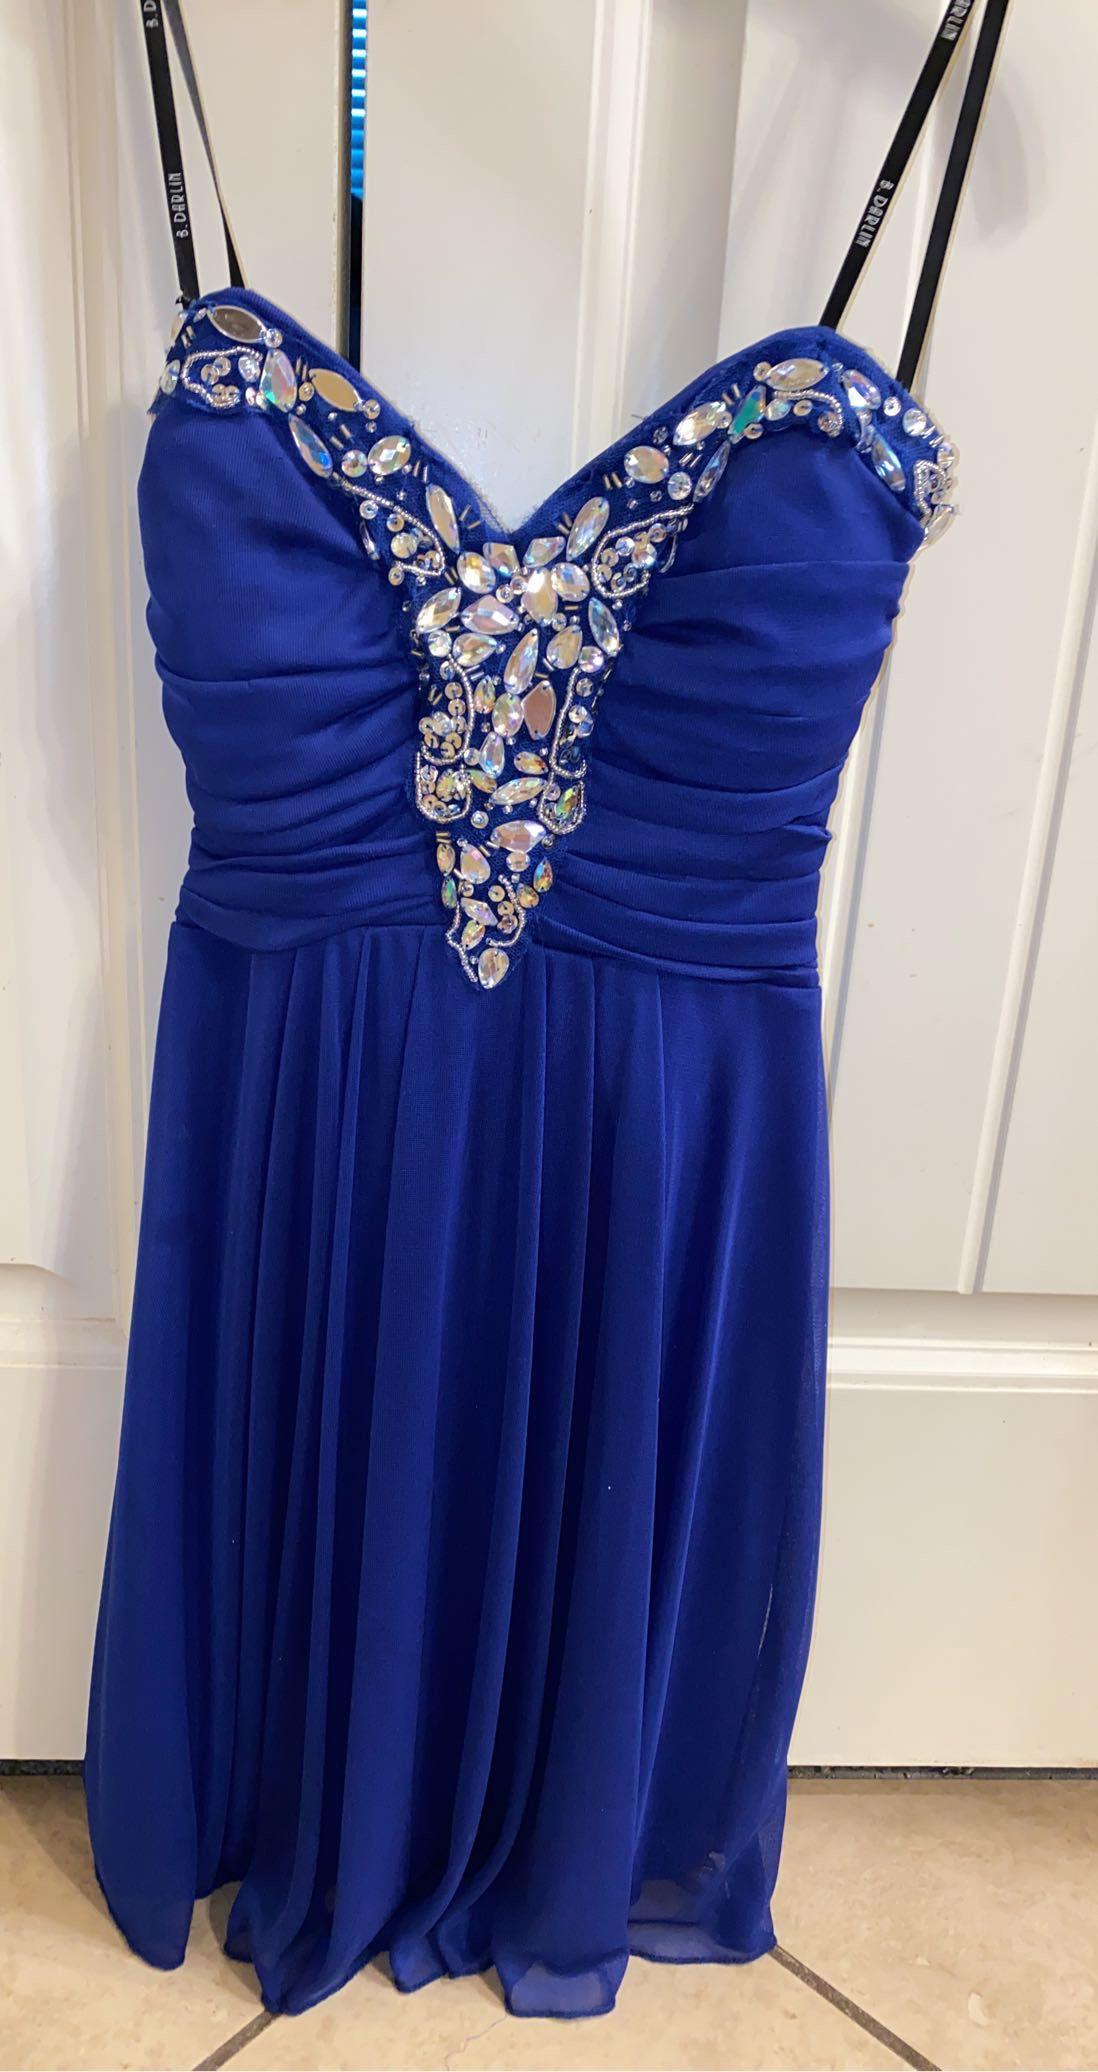 B. Darlin Blue Size 0 Mini A-line Dress on Queenly